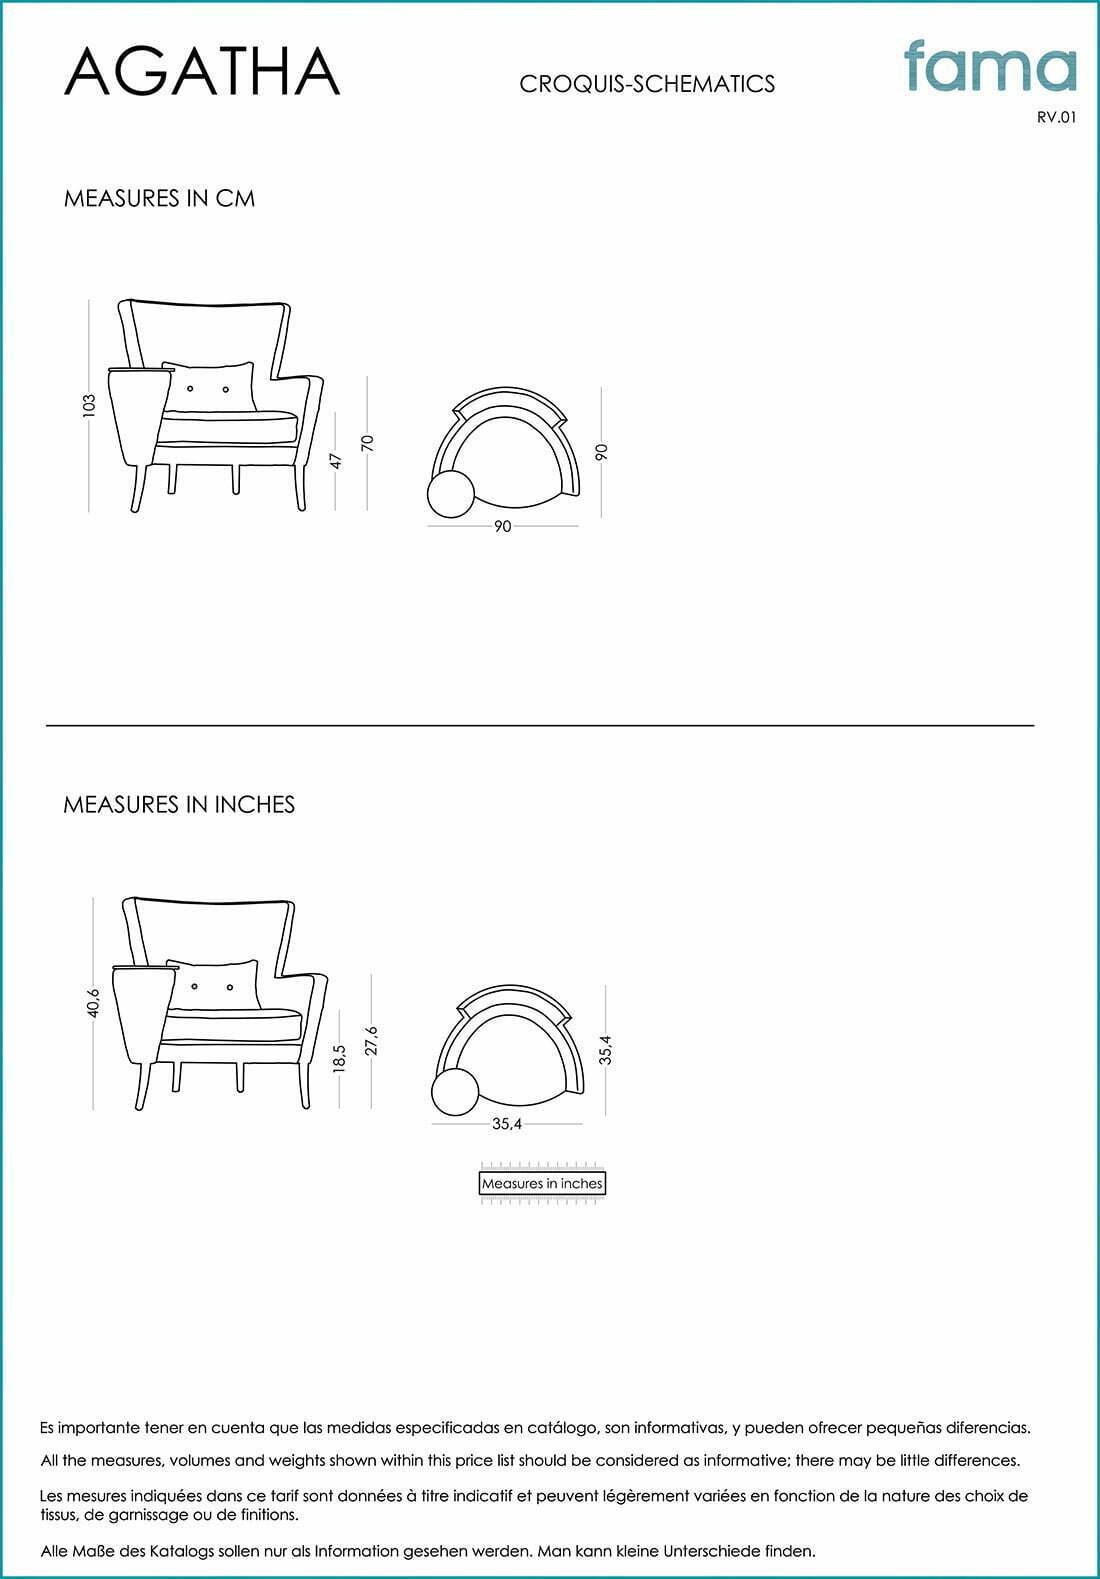 fauteuil-moderne-famaliving-montreal-agatha-fiche-technique